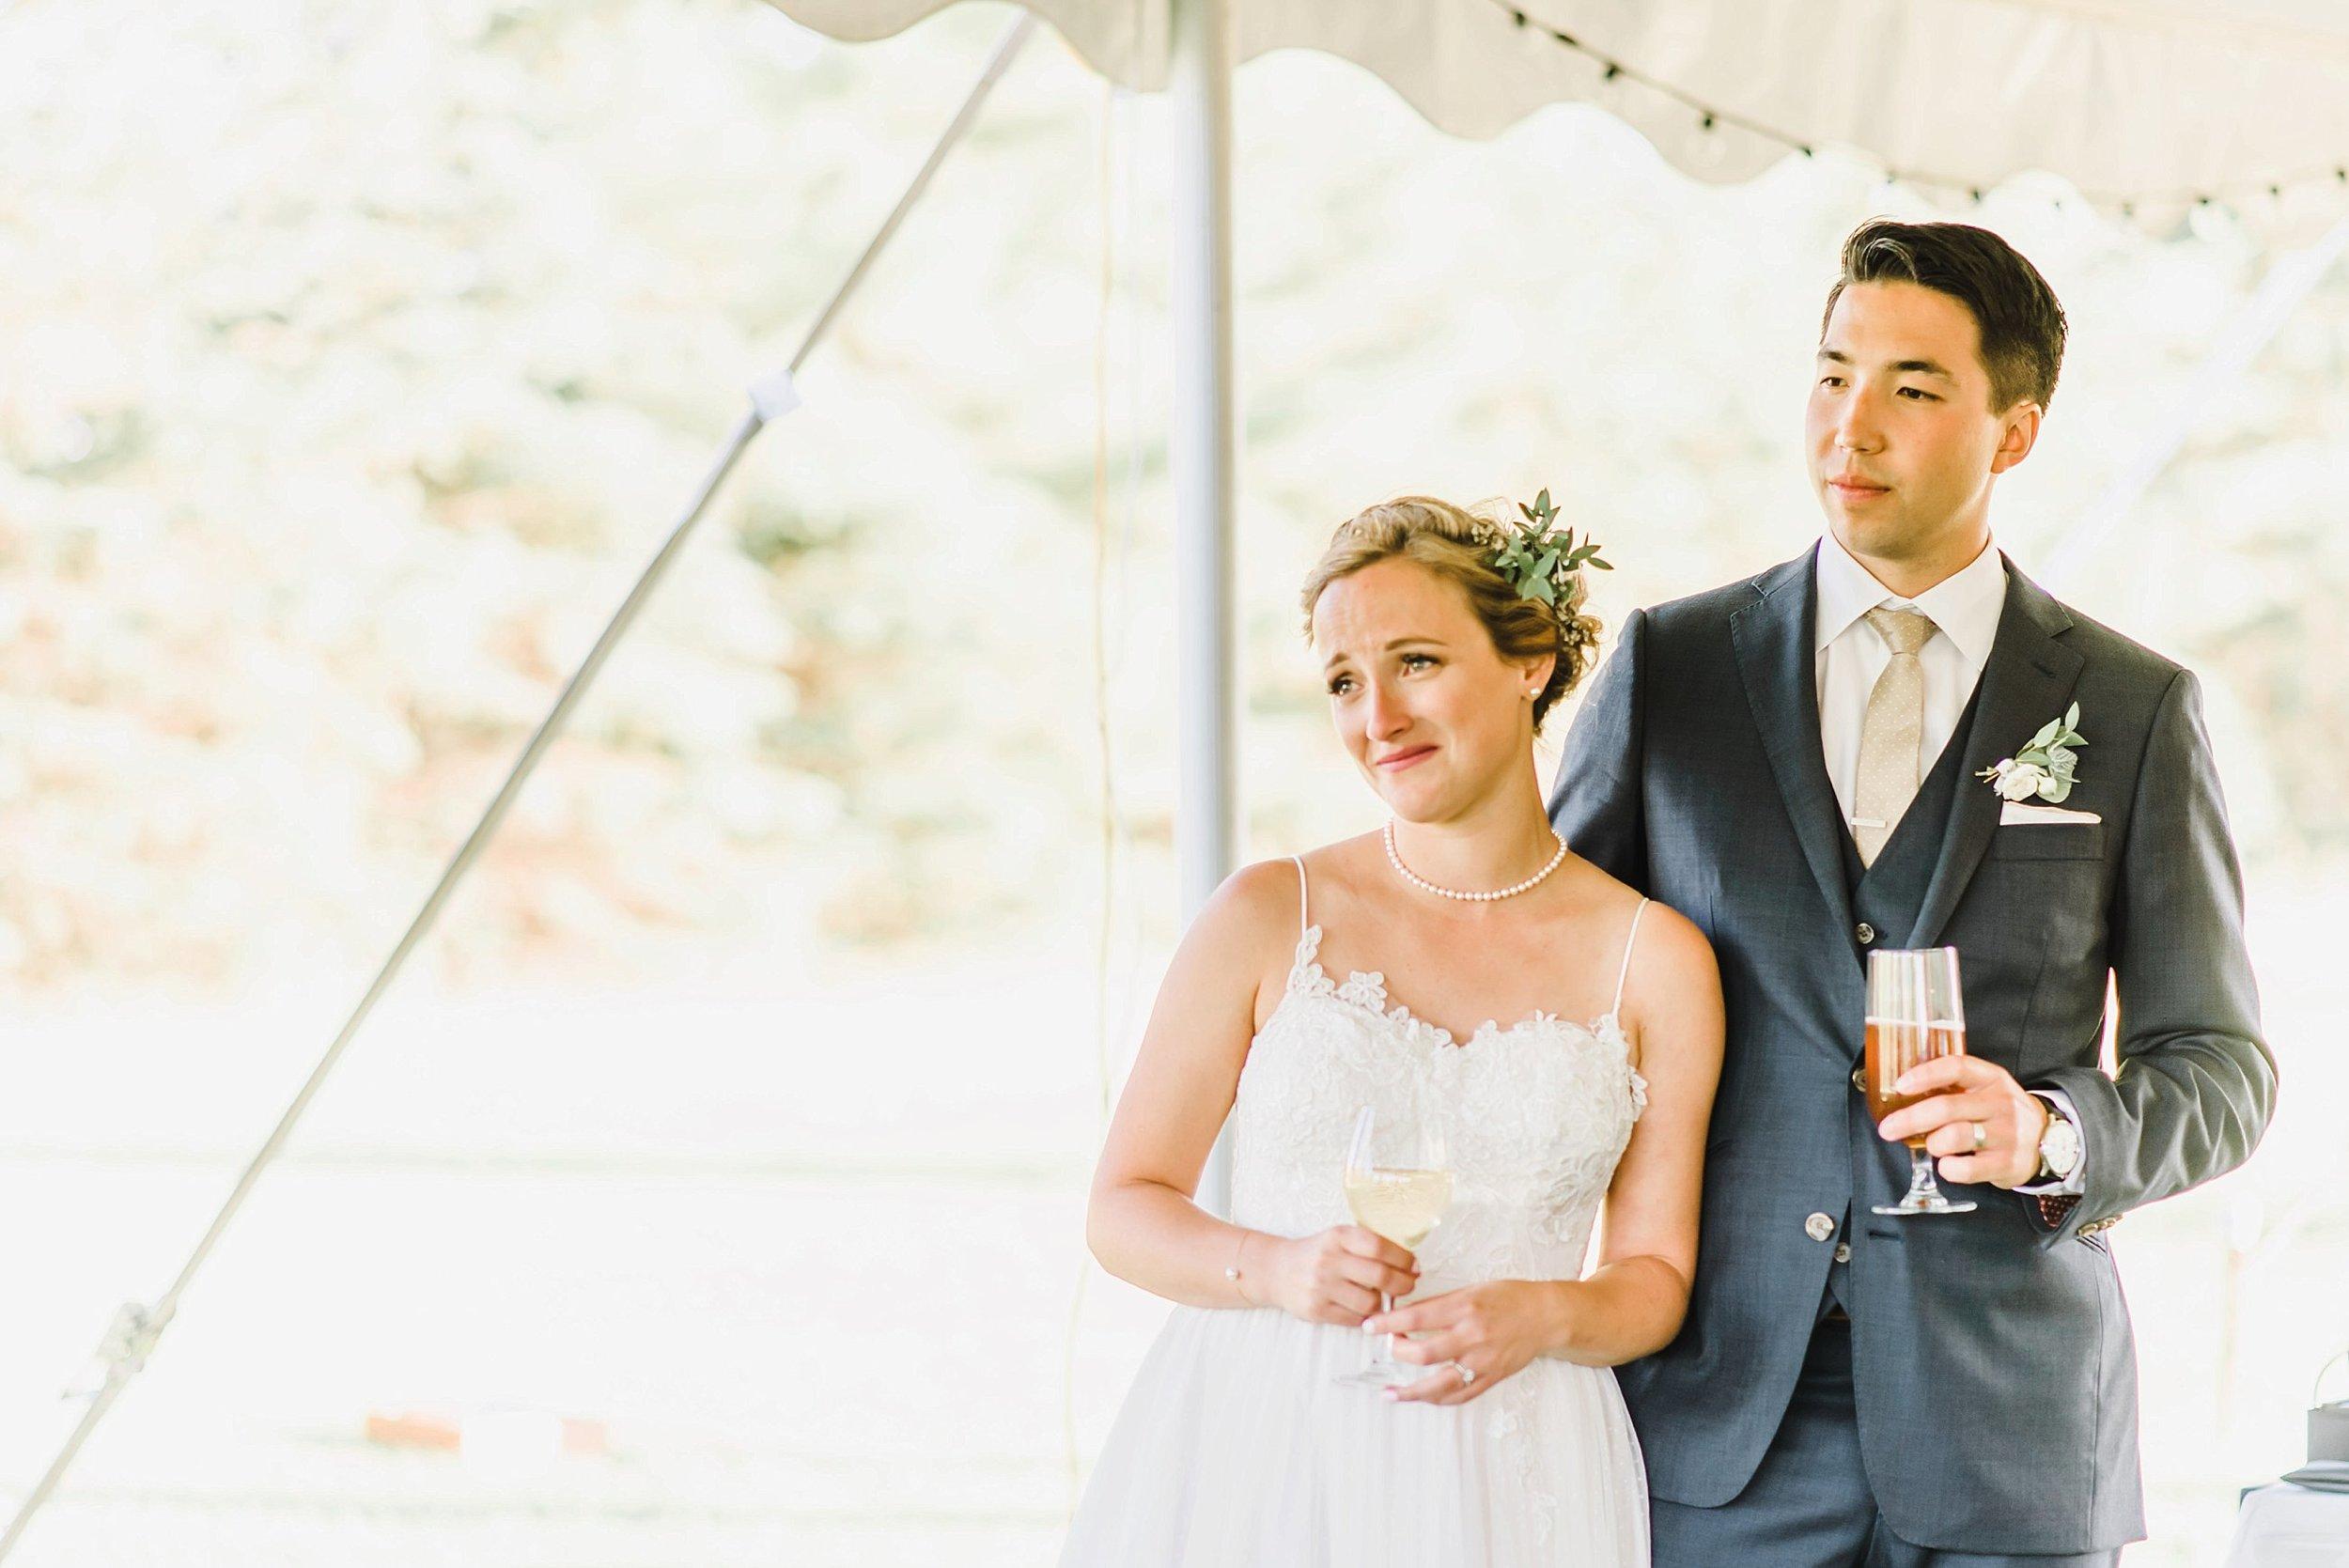 light airy indie fine art ottawa wedding photographer | Ali and Batoul Photography_0886.jpg